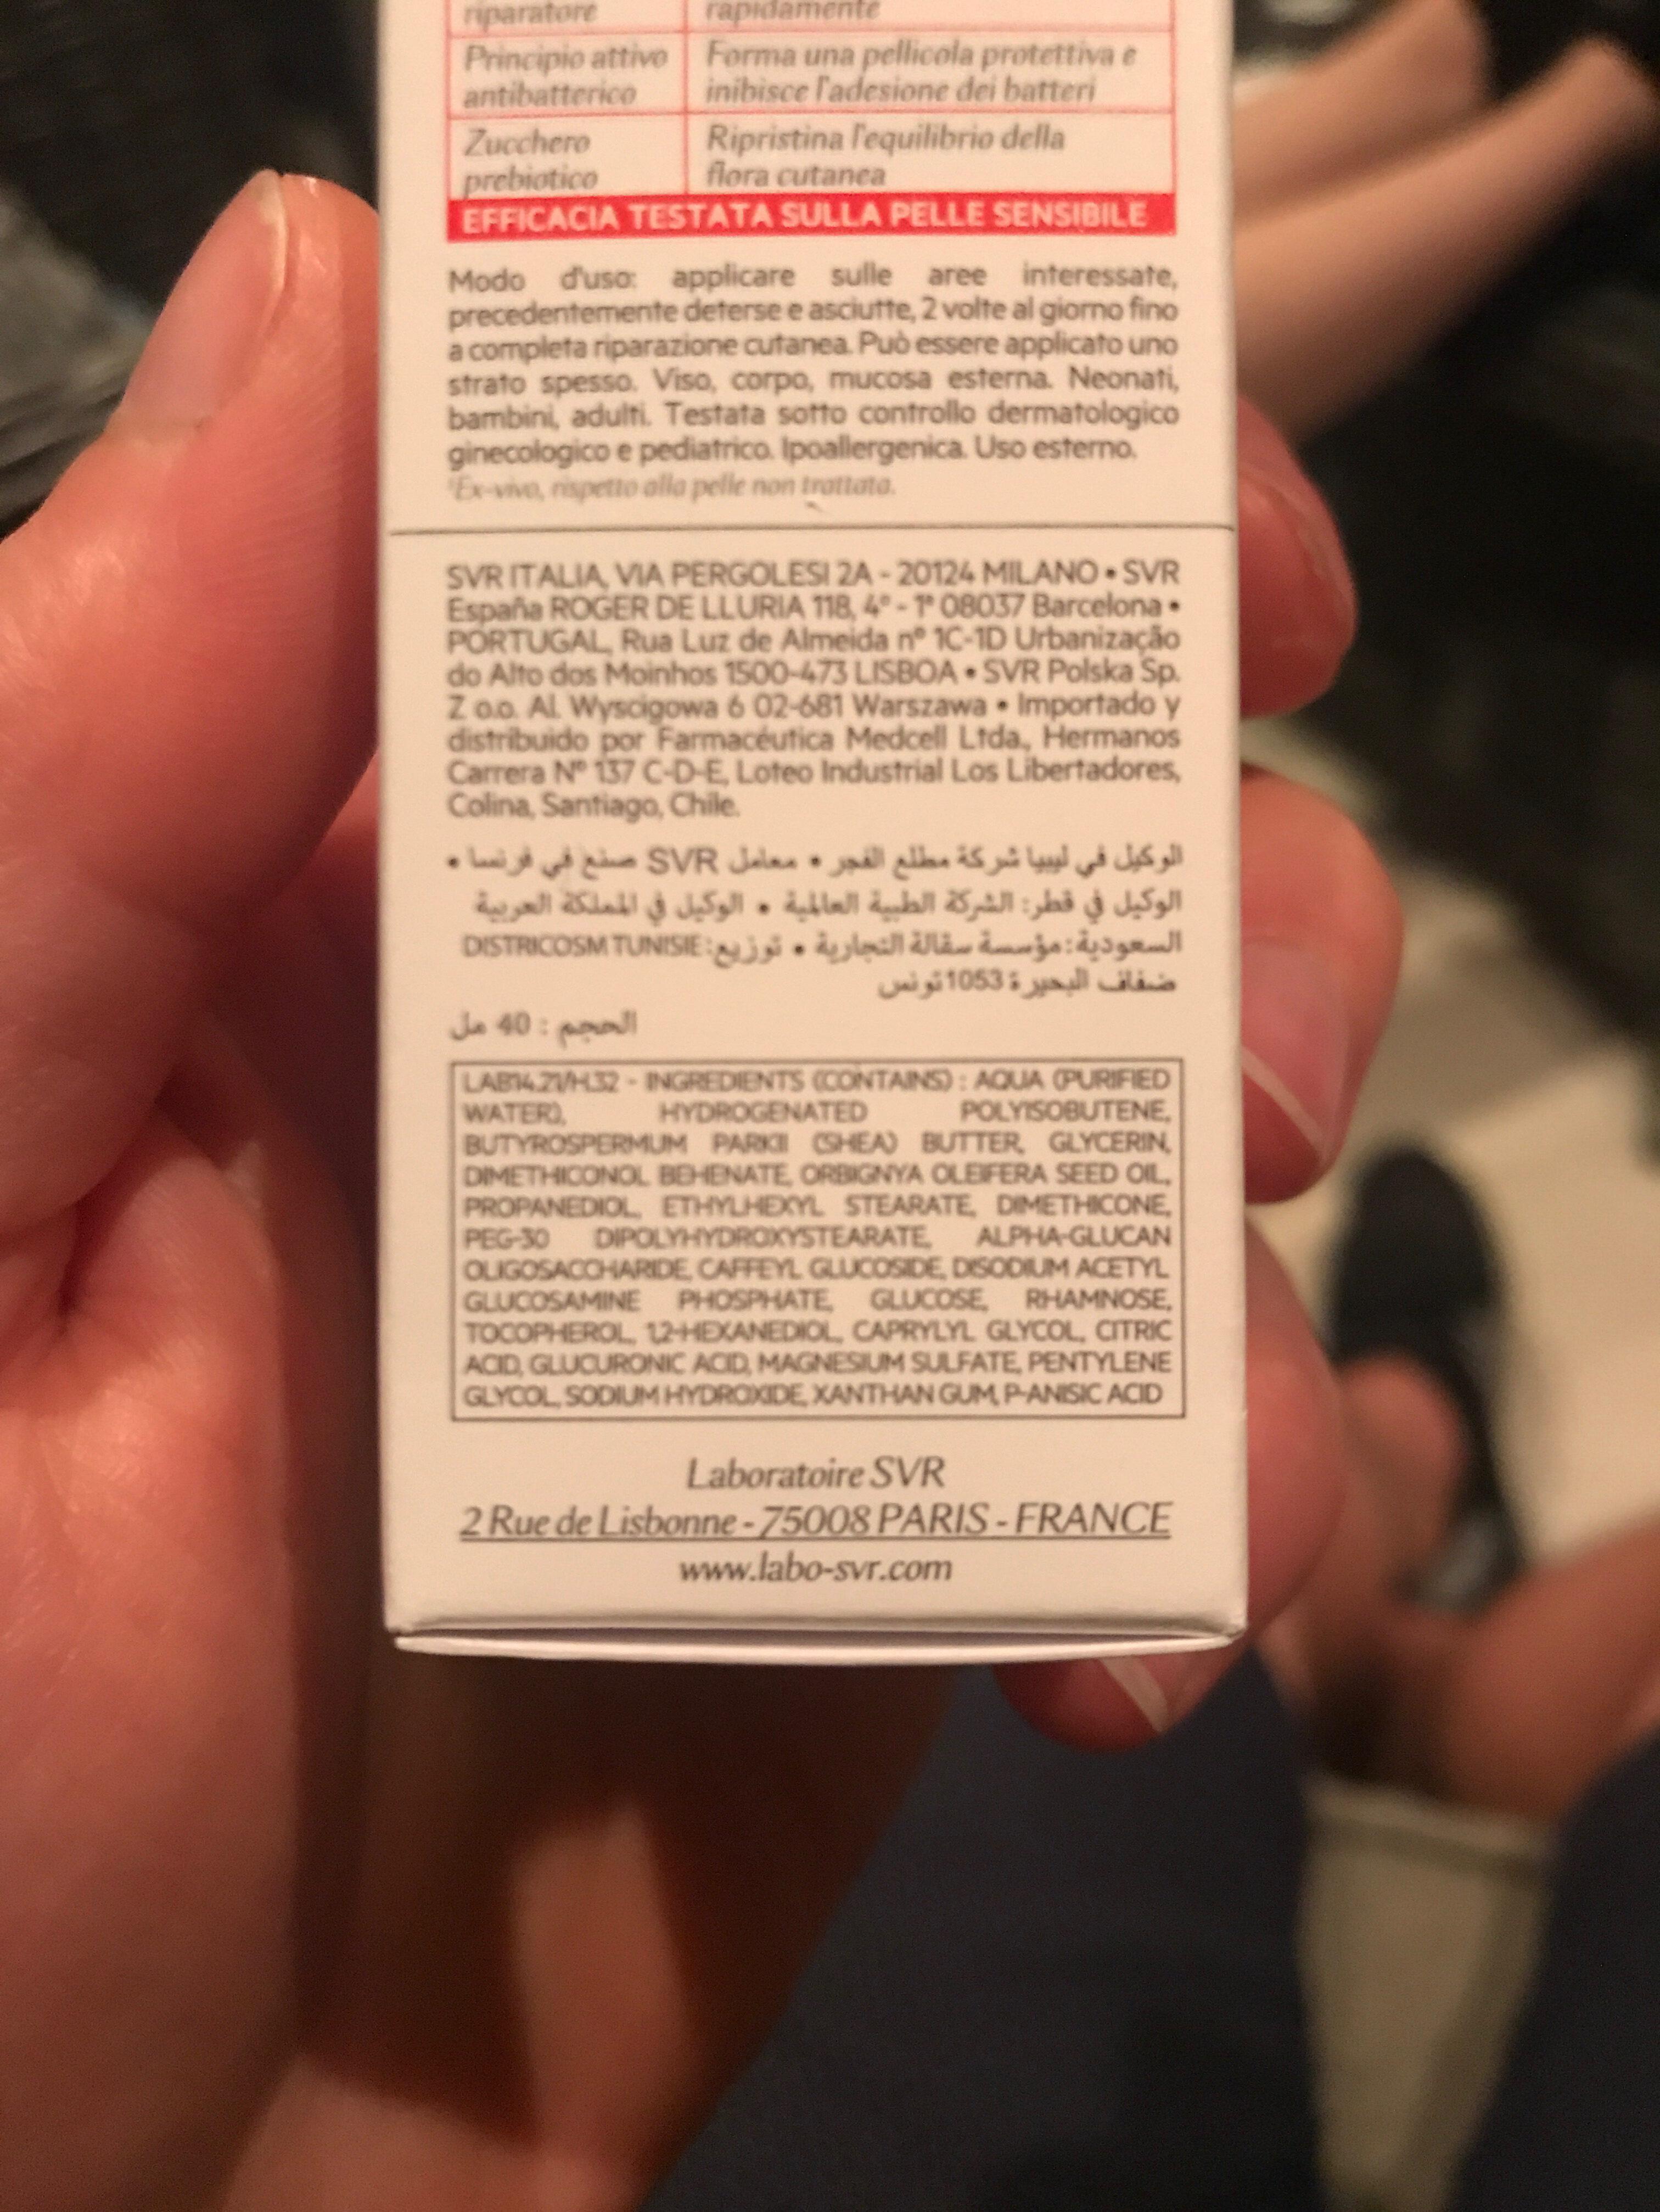 Cicavit + - Ingredients